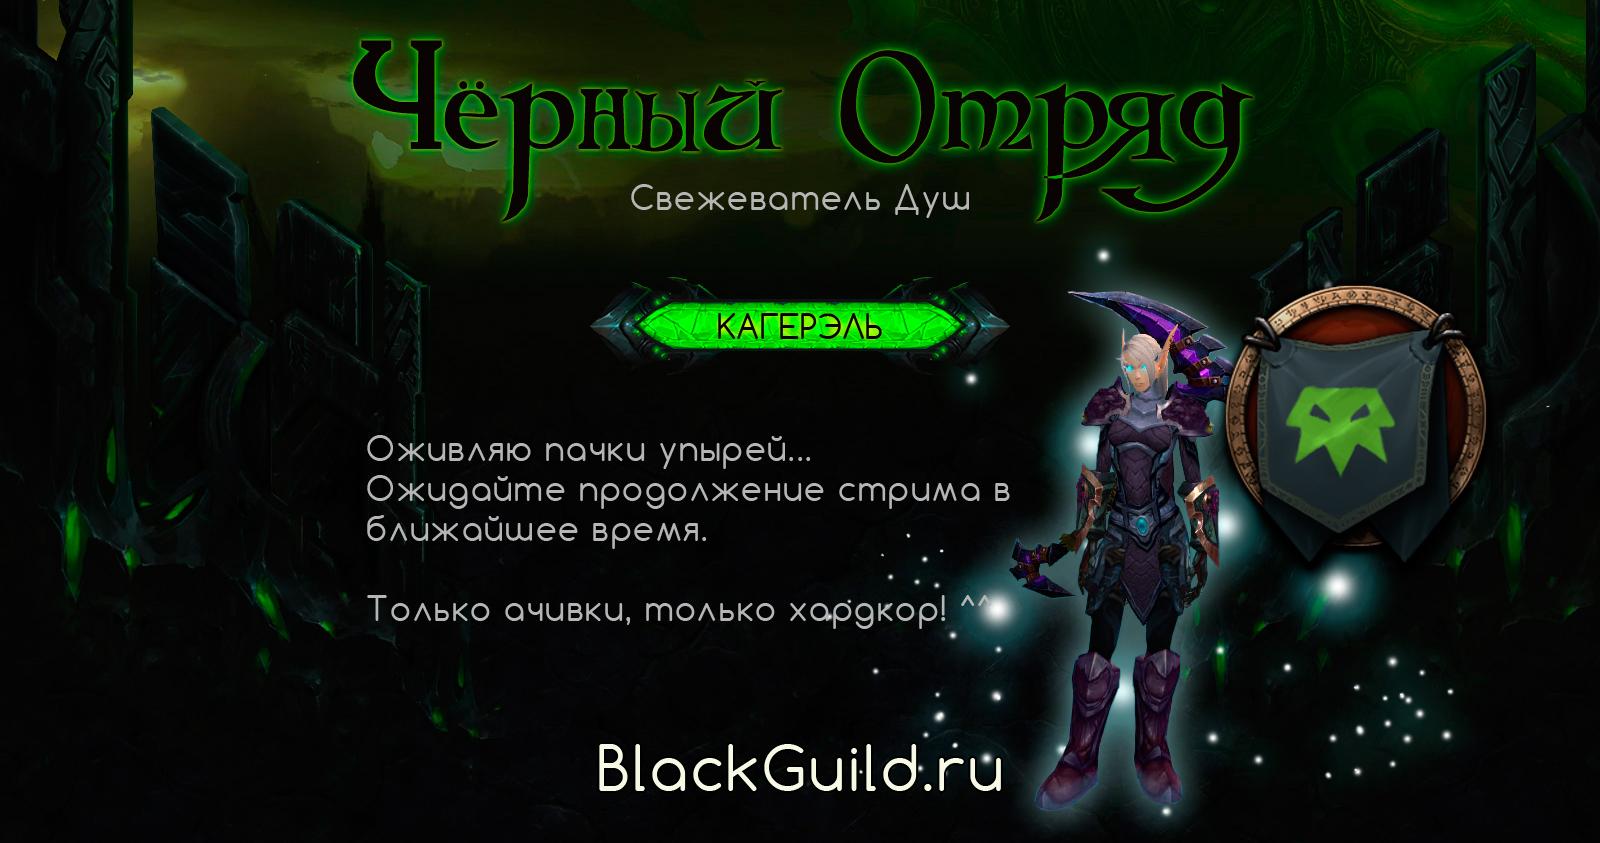 http://s3.uploads.ru/nAXgU.jpg